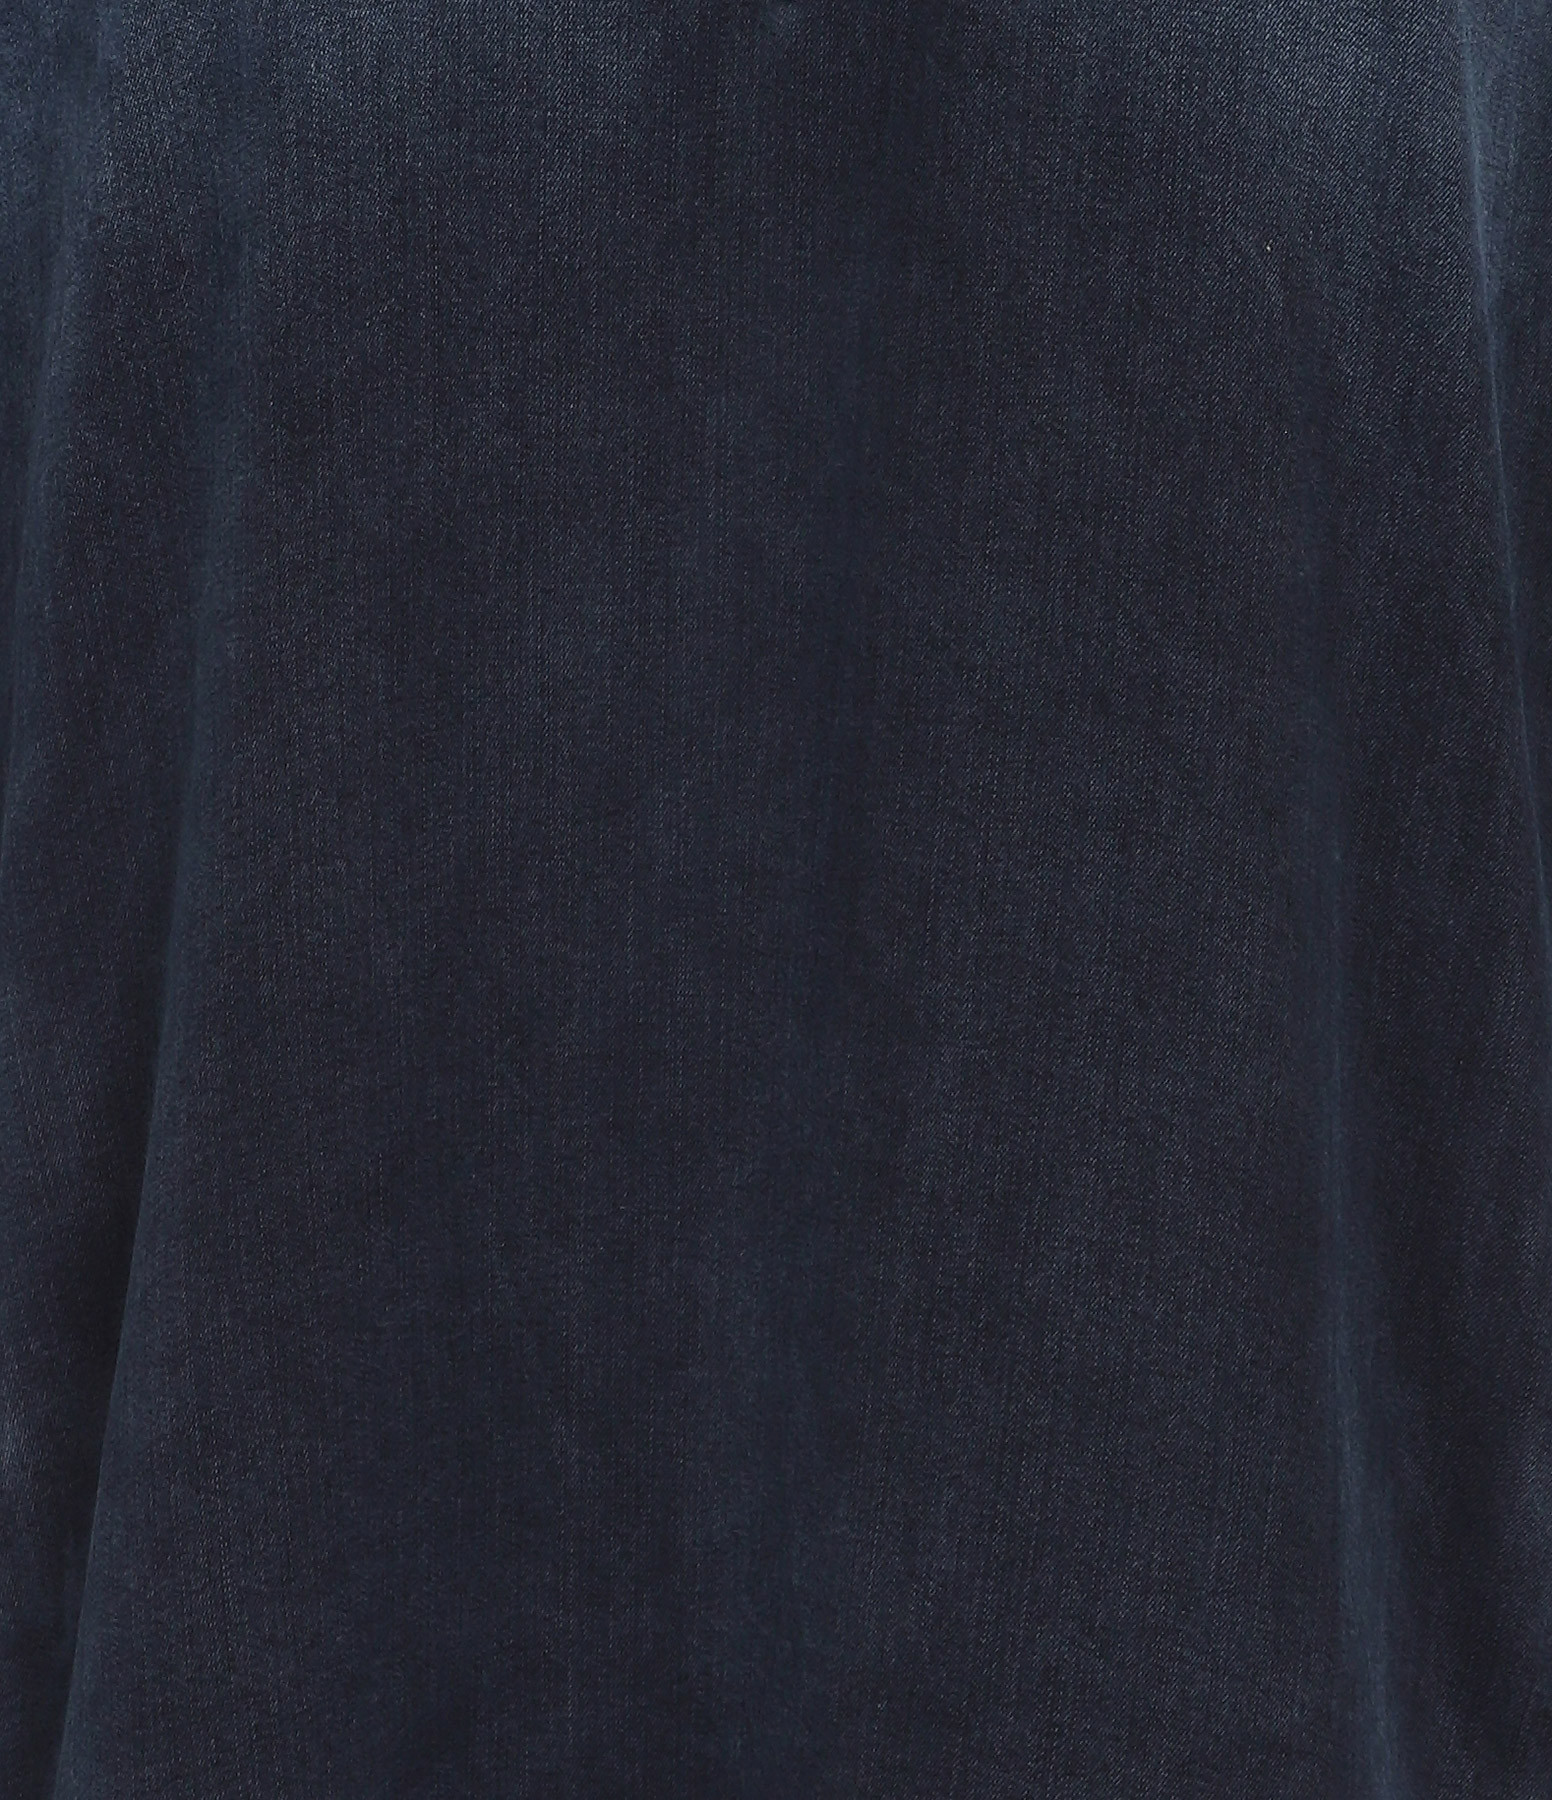 BELLA DAHL - Robe Chemise Denim Indigo Foncé